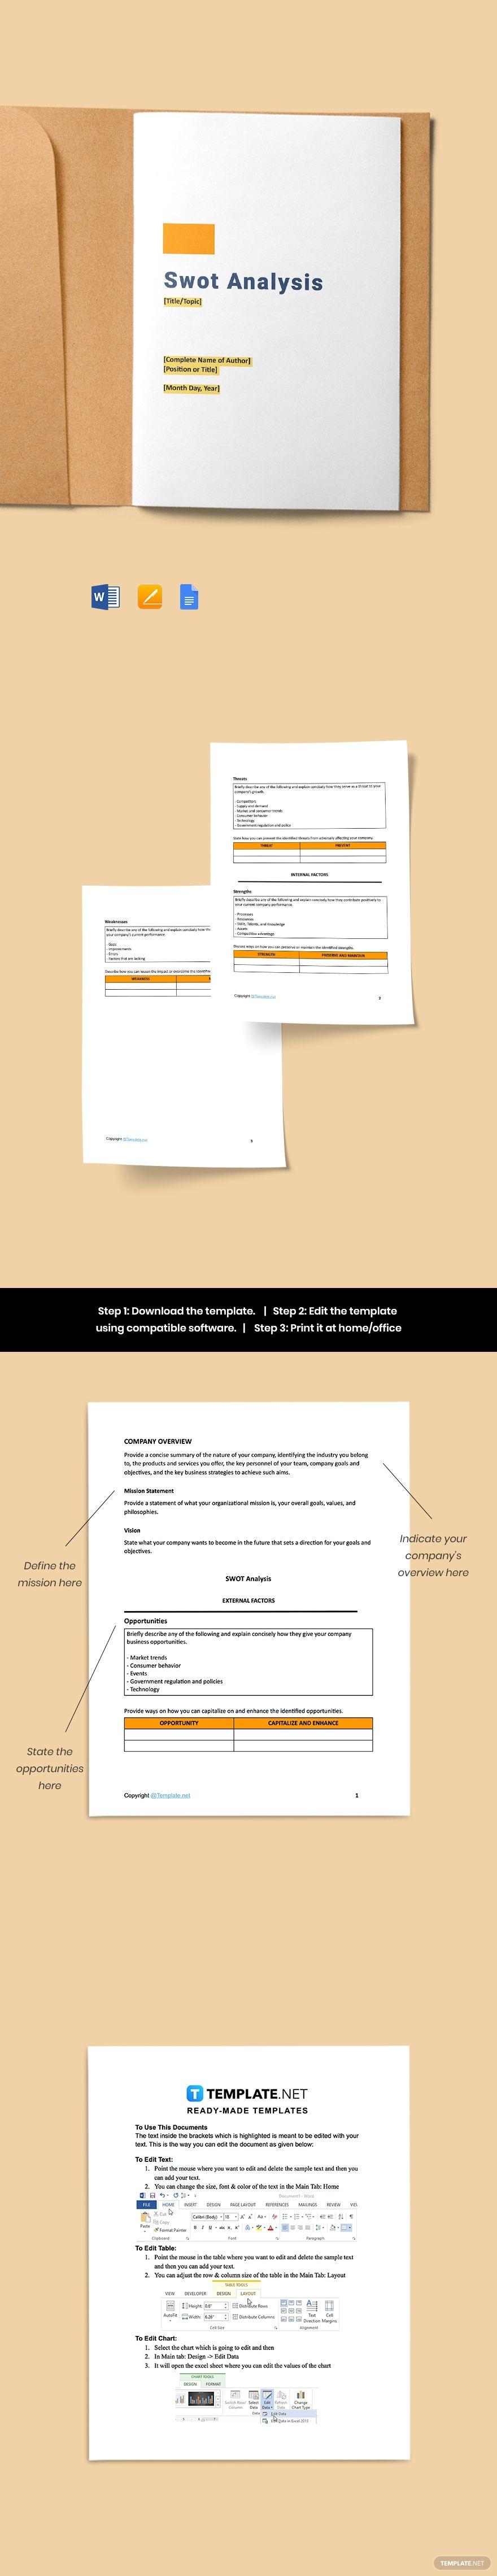 Blank Swot Analysis Template Free Pdf Google Docs Word Apple Pages Template Net Swot Analysis Swot Analysis Template Analysis